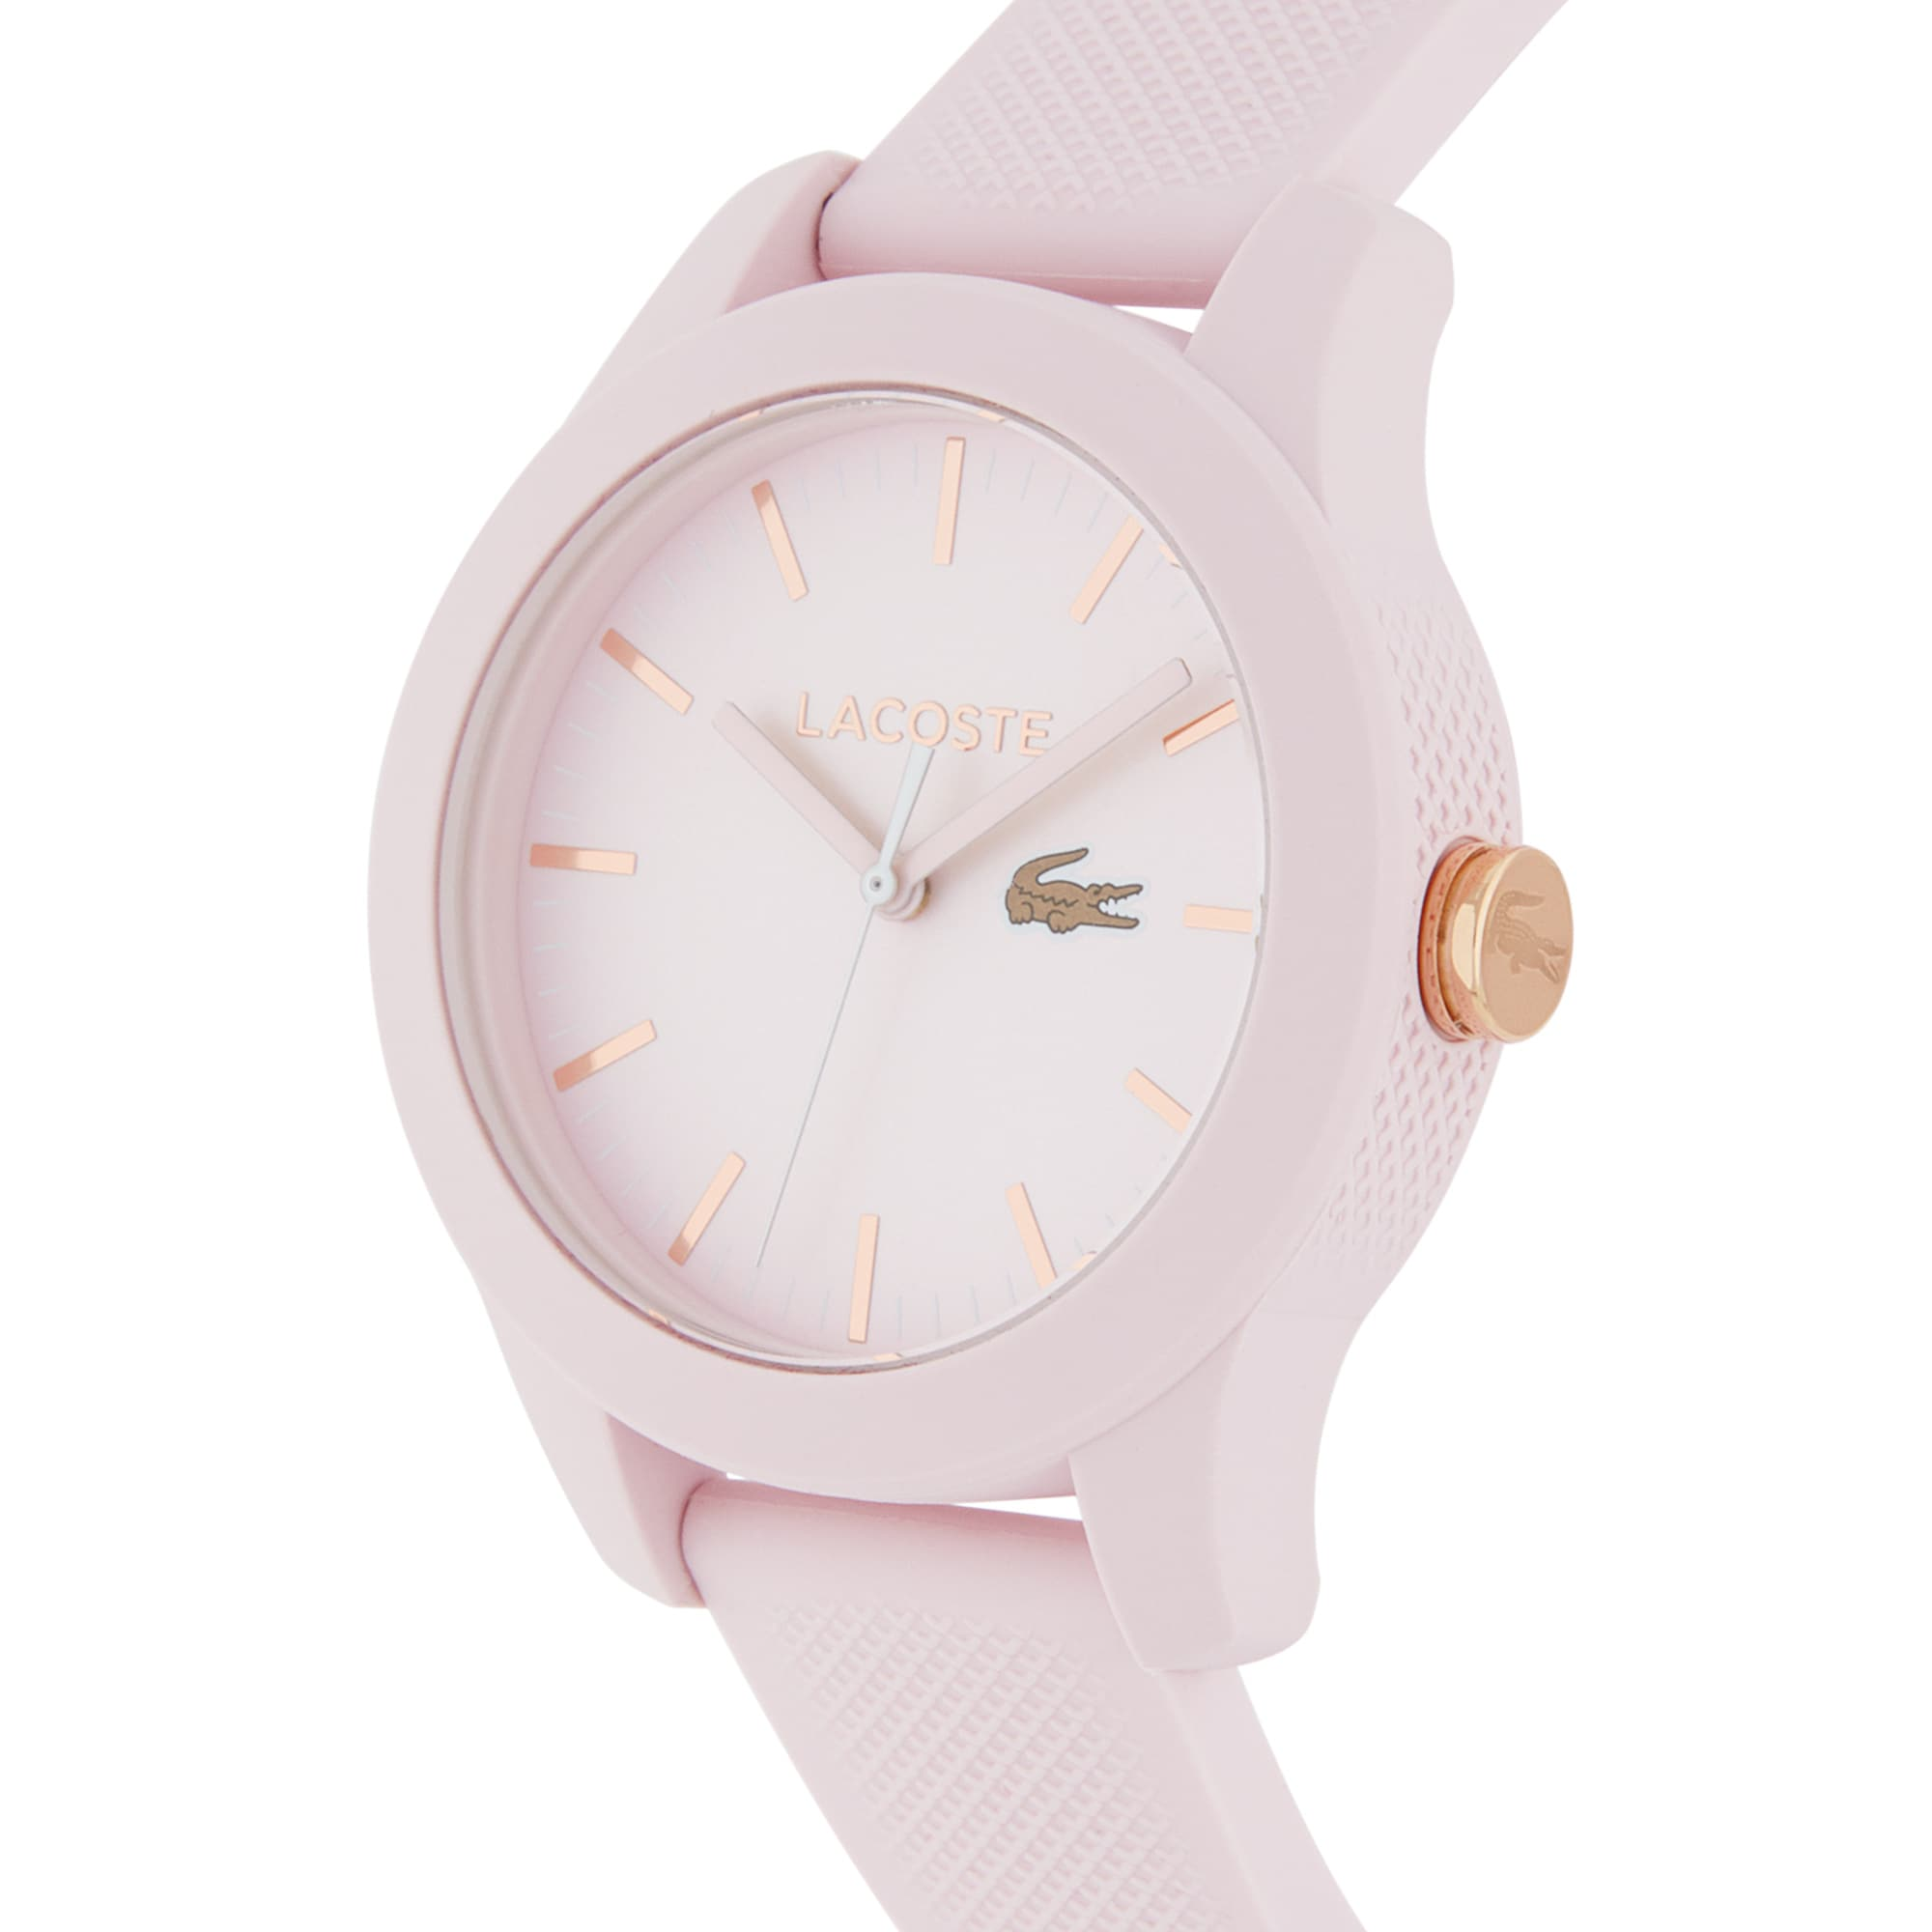 Reloj de Mujer Lacoste 12.12 con Correa de Silicona Rosa